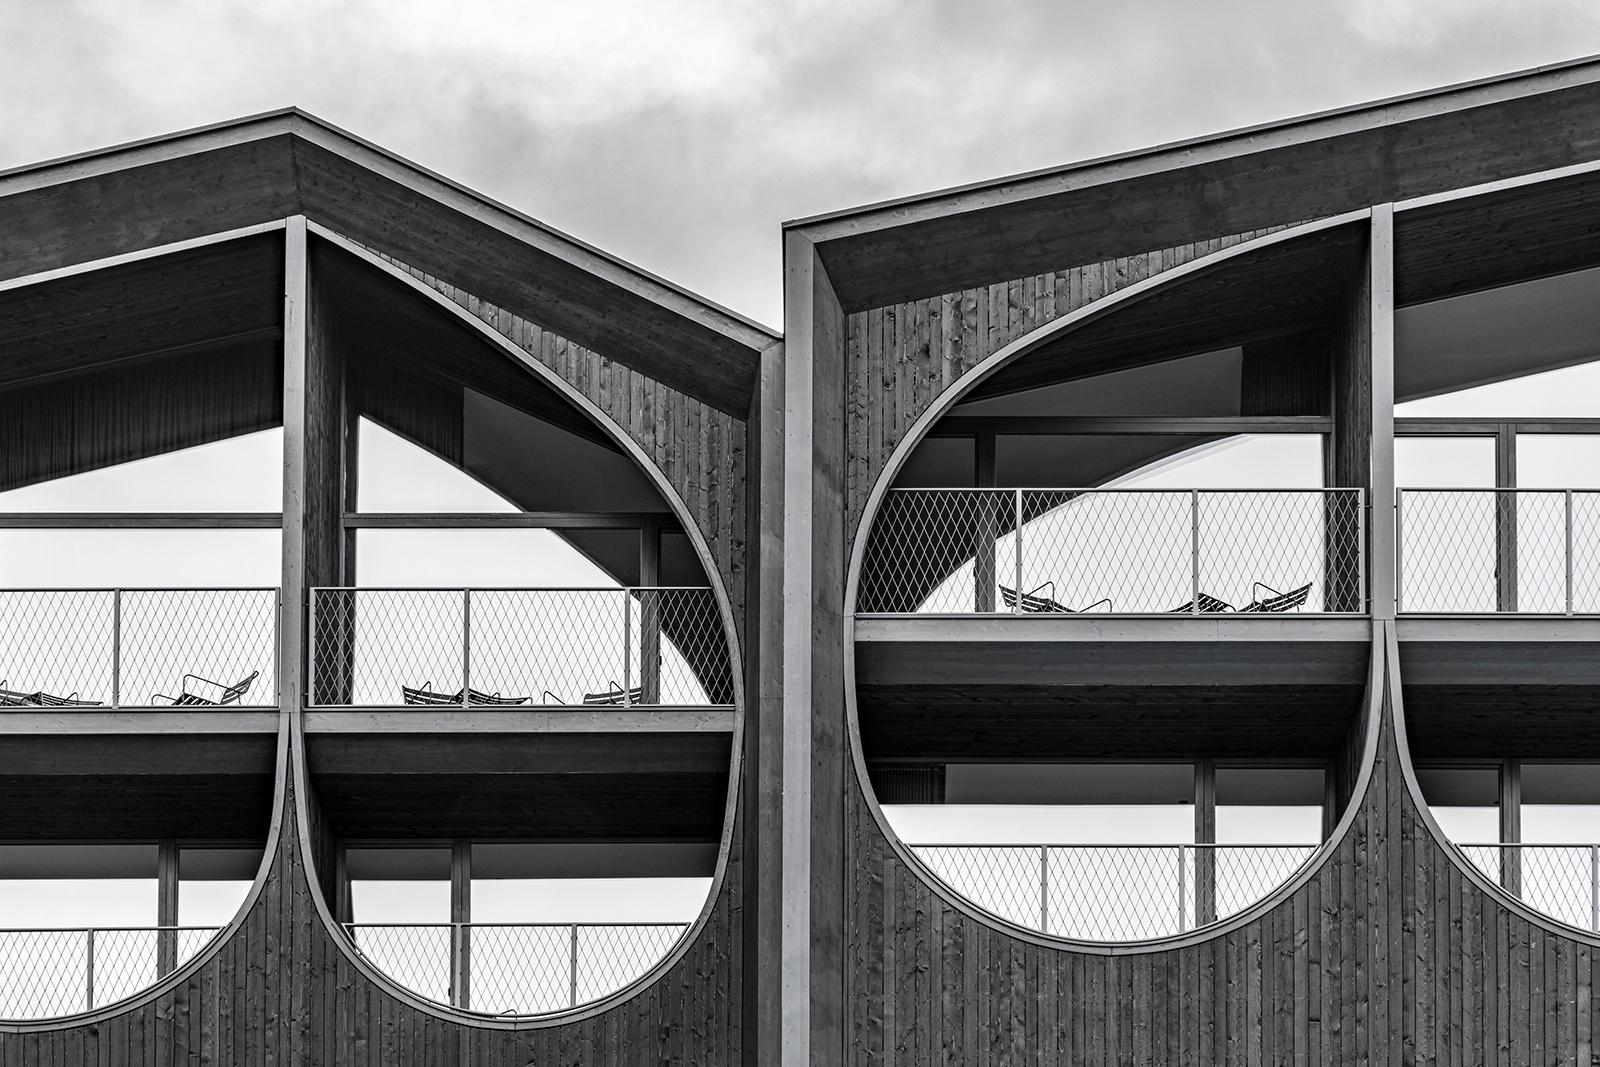 05_Peter_Pichler_Architecture_Hotel_Milla_Montis